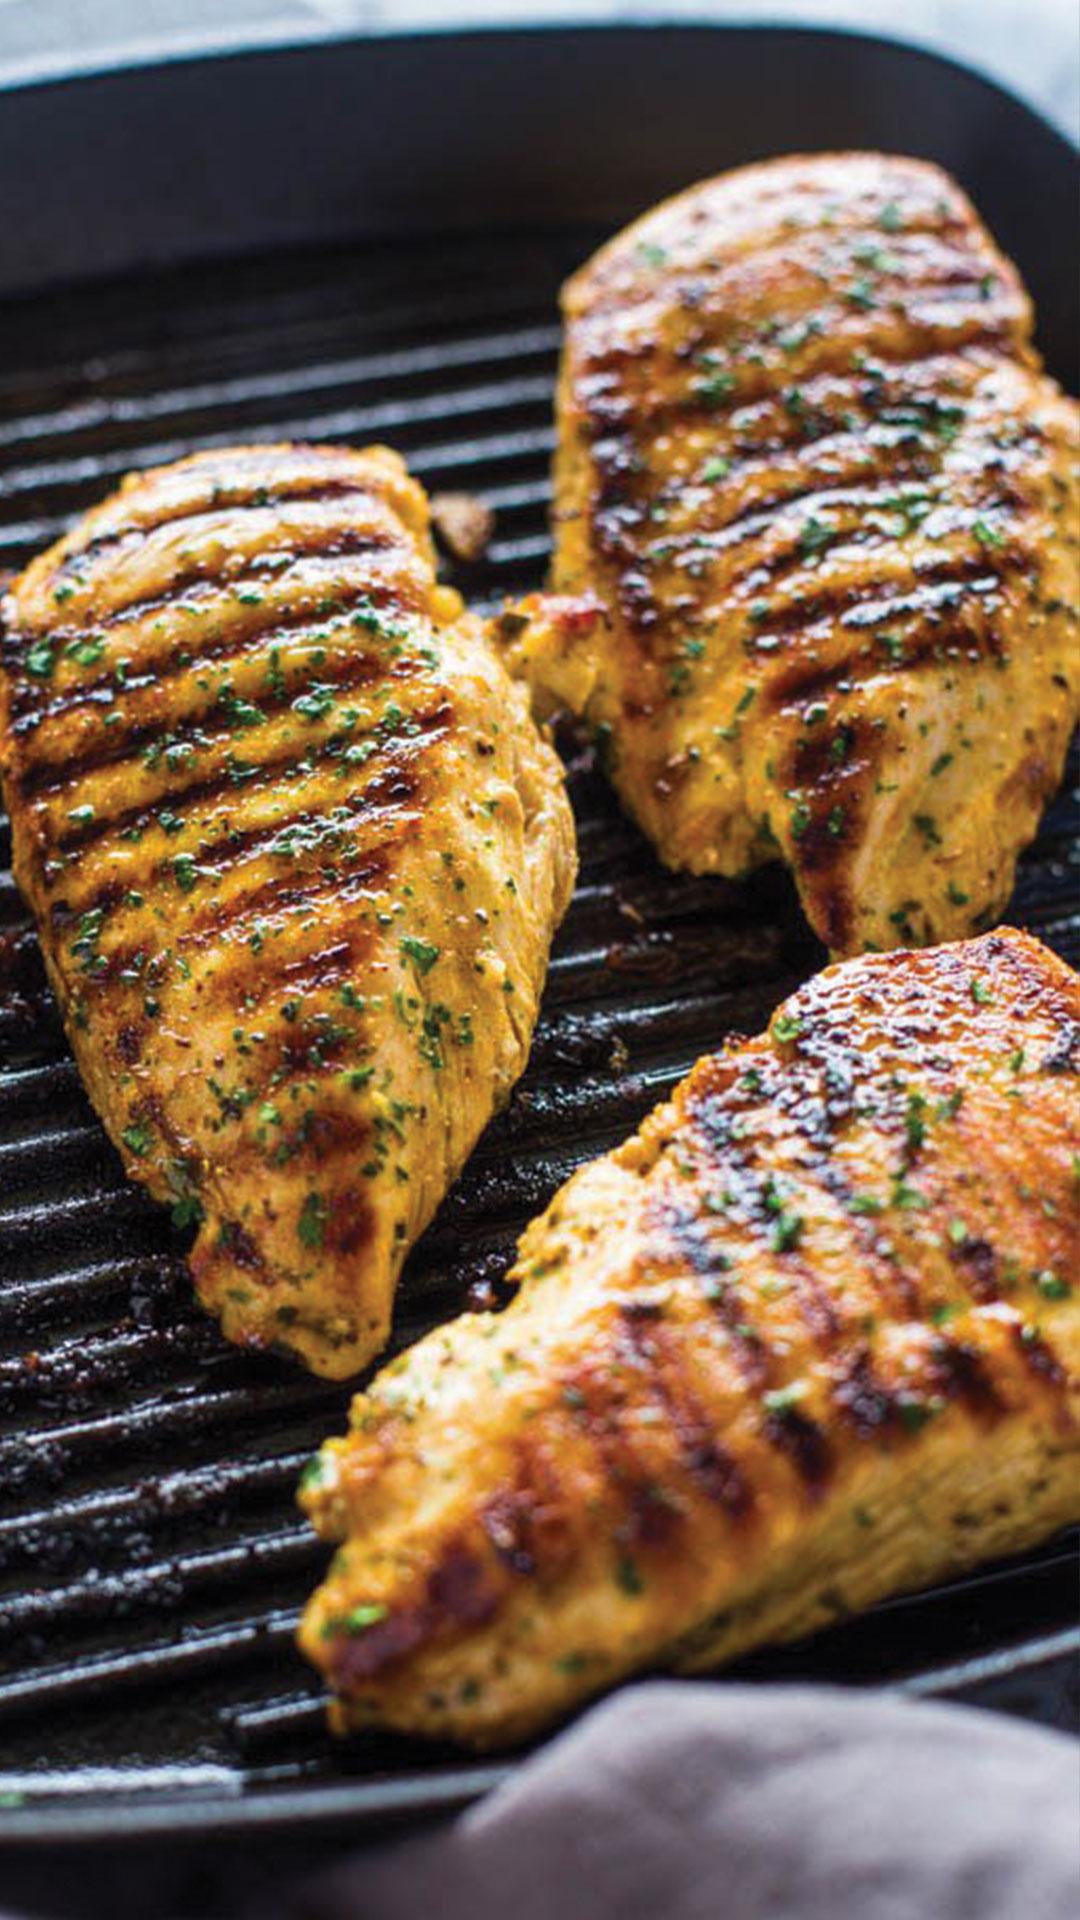 CHICKEN - Classic chicken fried steak, steak cutlets, pounded thin, breaded, fried.